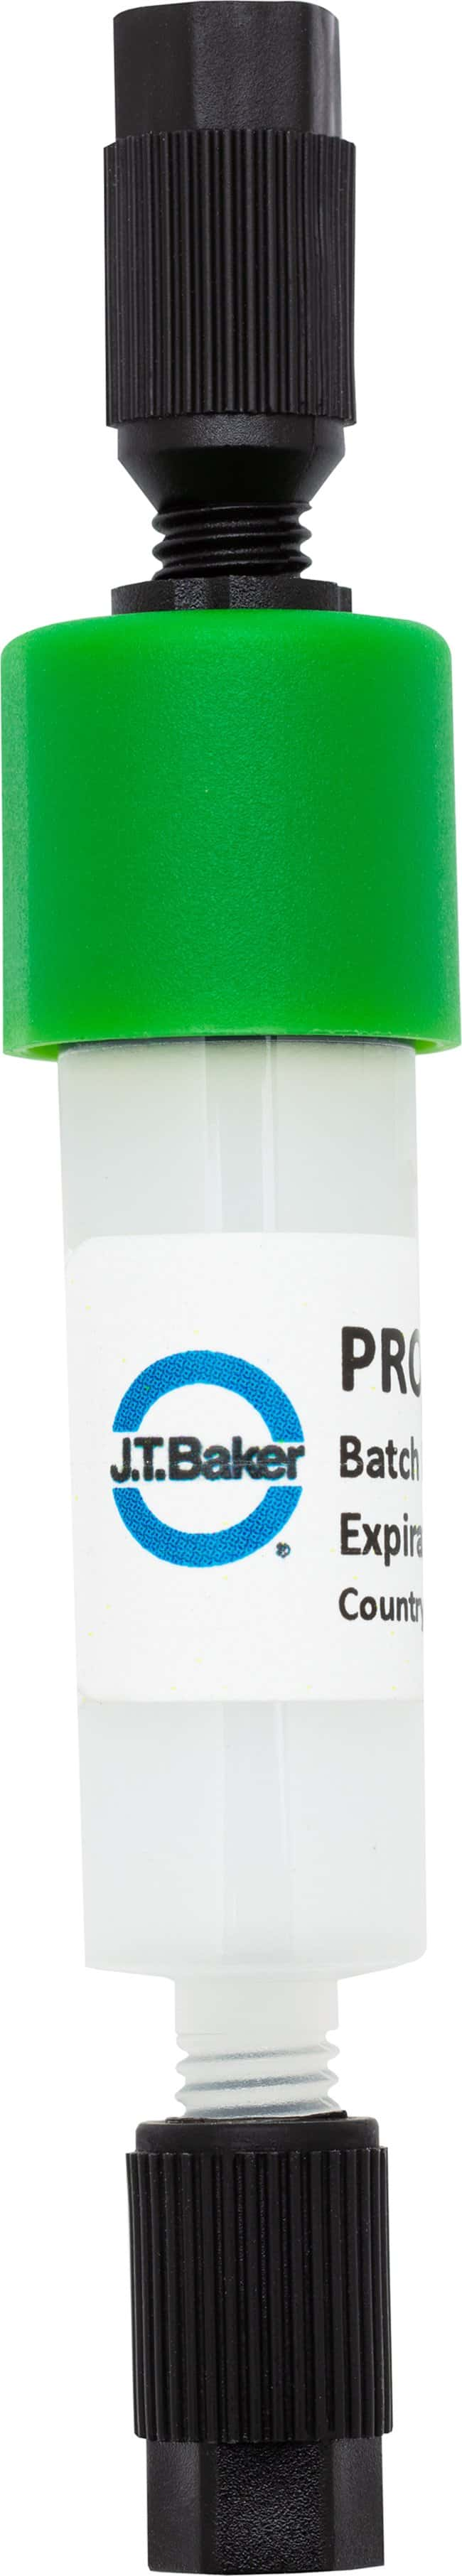 J.T. Baker™BAKERBOND™ PROchievA™ Recombinant Protein A Resin, Affinity Chromatography Columns, Avantor